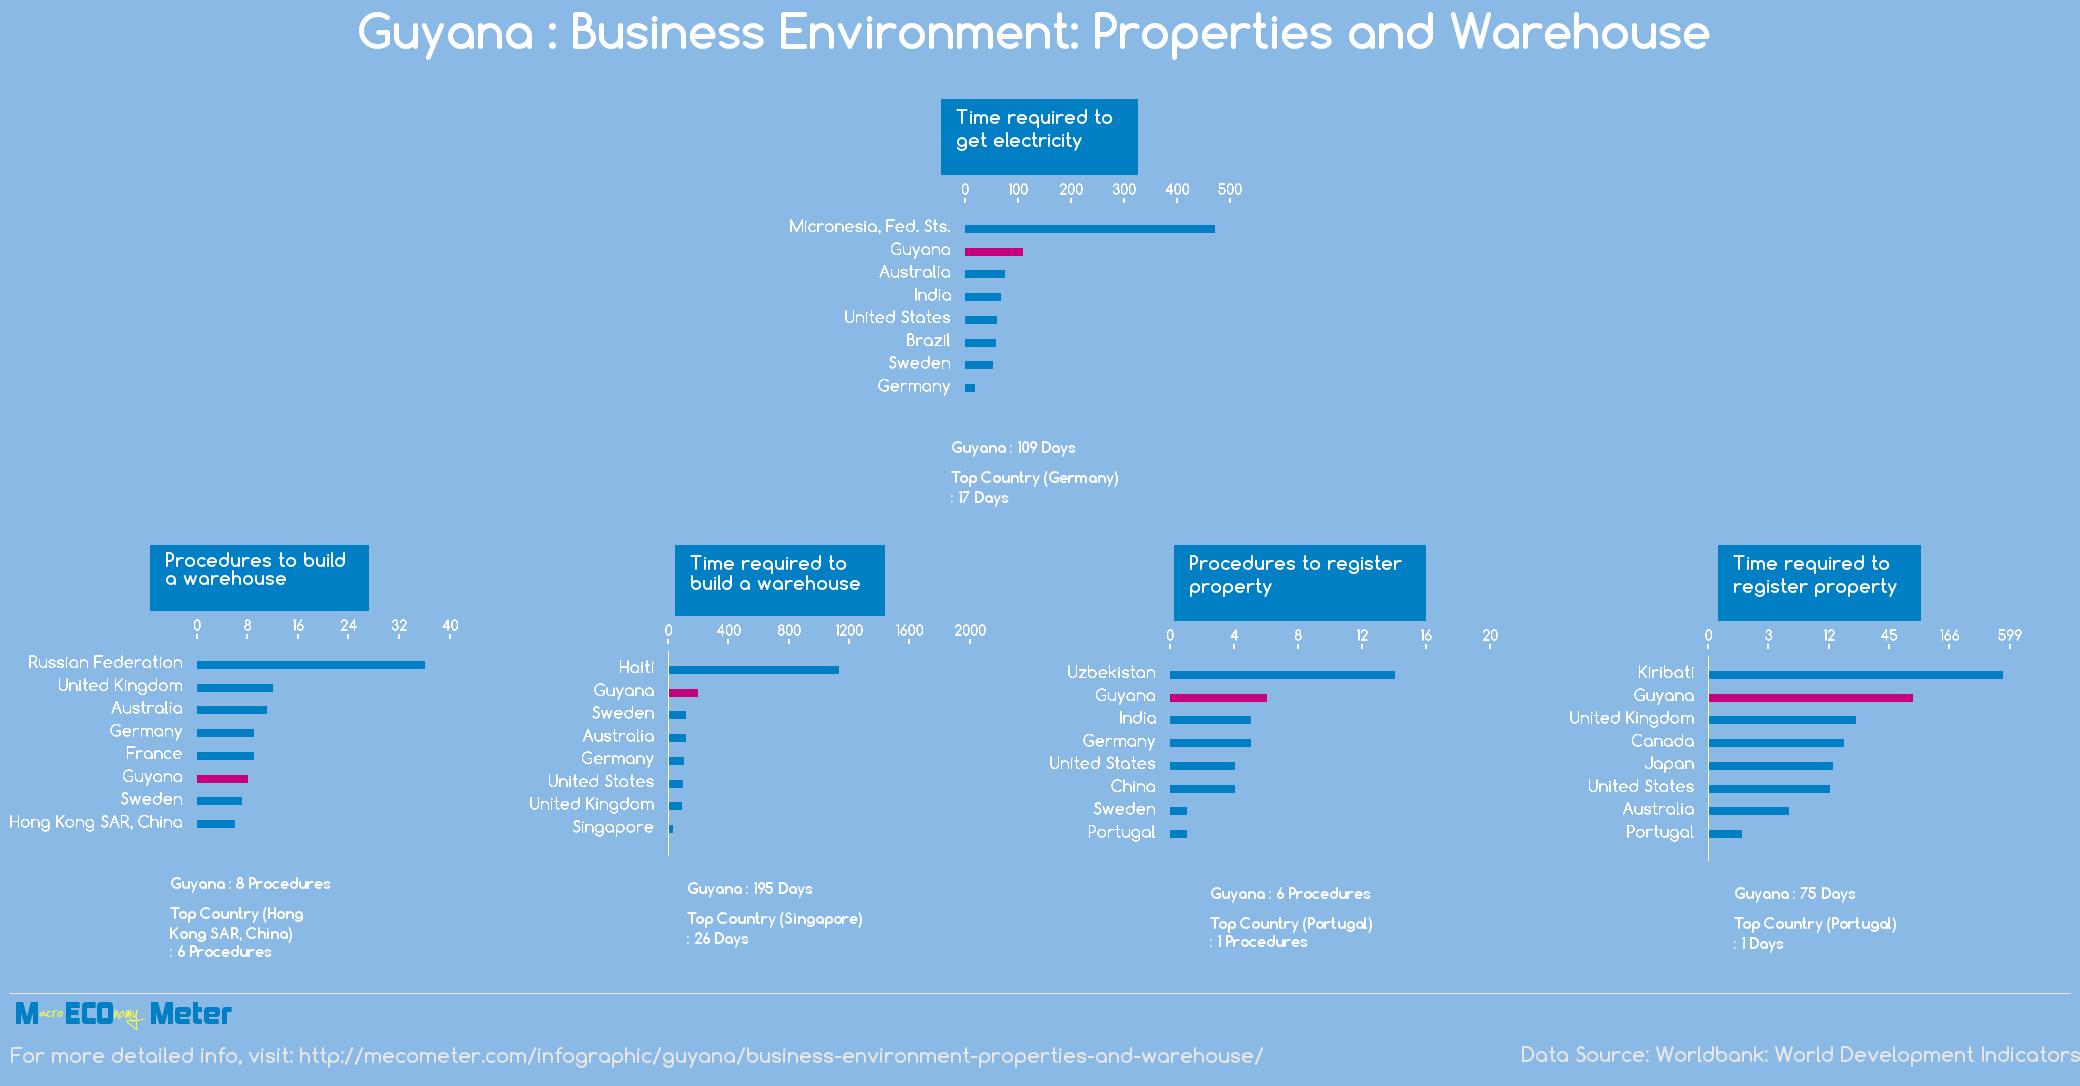 Guyana : Business Environment: Properties and Warehouse